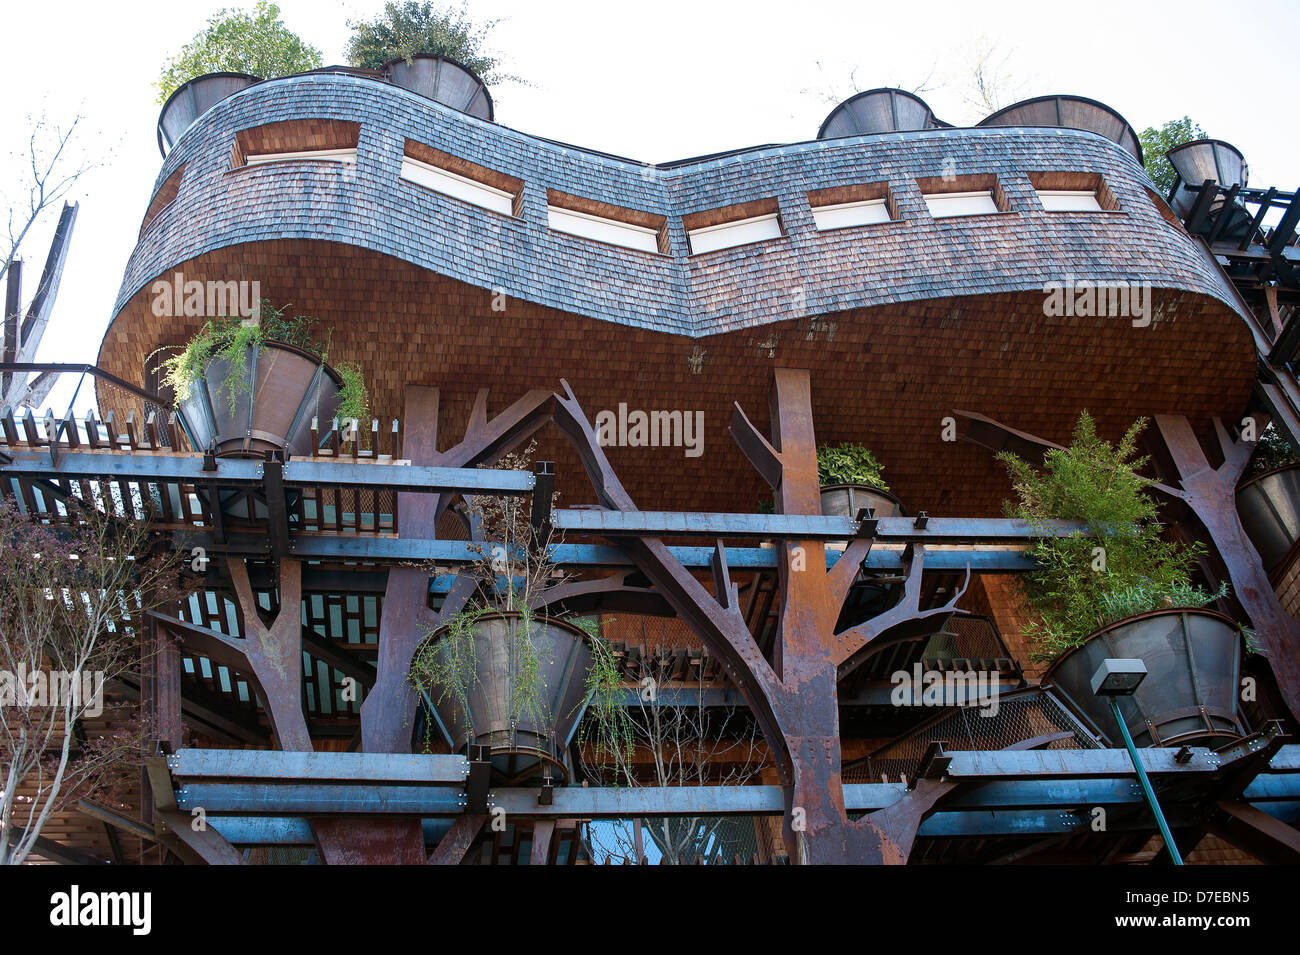 Europa Italia Piemonte Torino la arquitectura moderna a través de Chiabrera el Treehouse por Luciano Pia Imagen De Stock